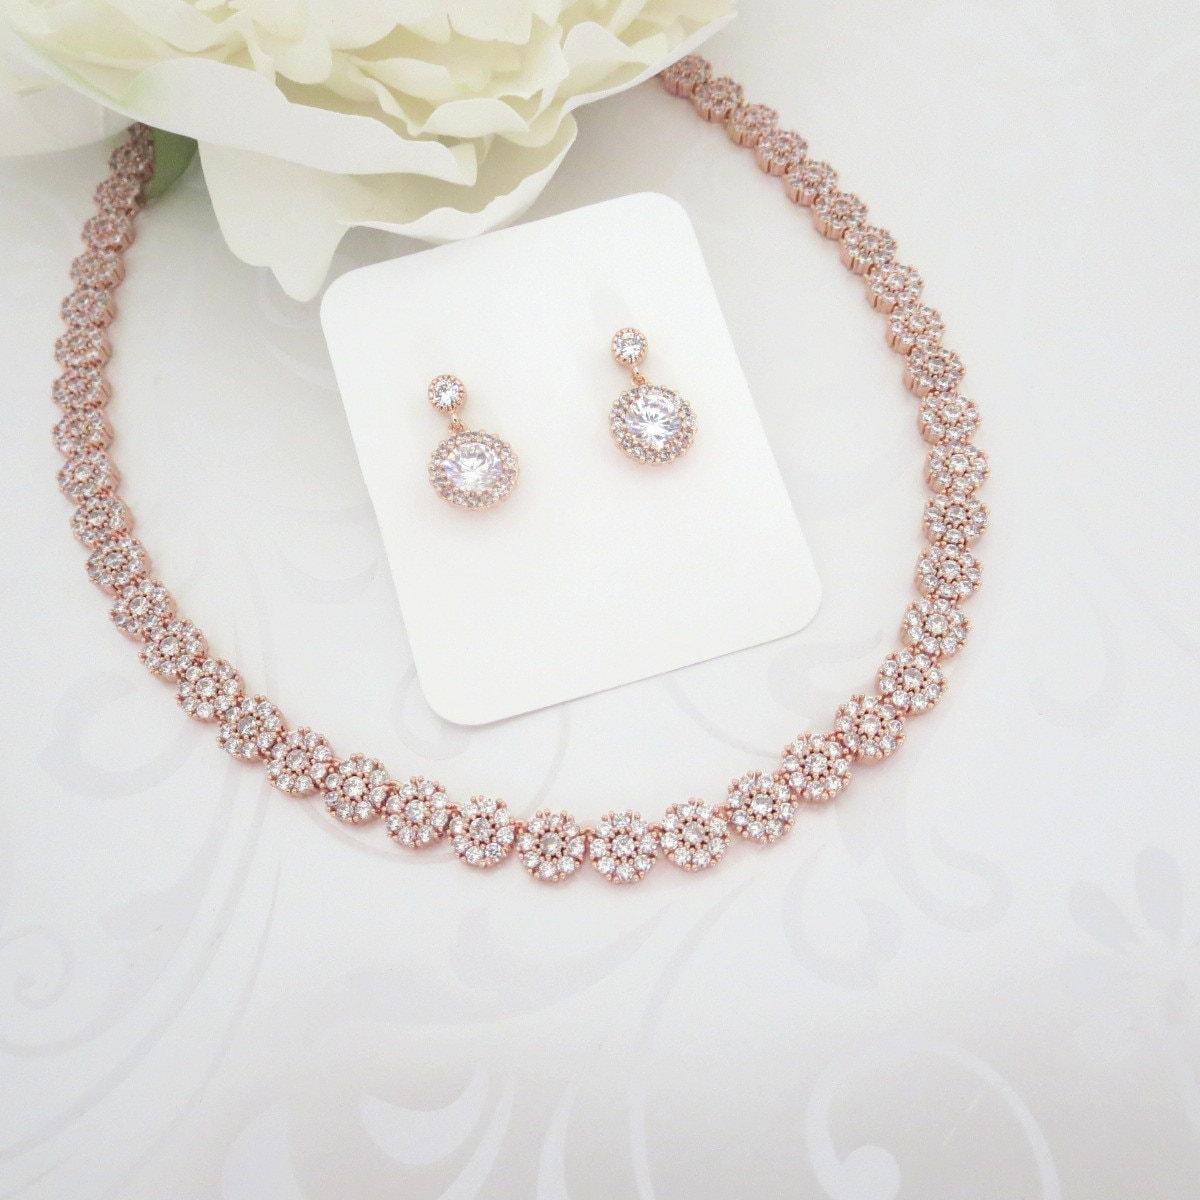 simple rose gold bridal necklace rose gold wedding jewelry. Black Bedroom Furniture Sets. Home Design Ideas